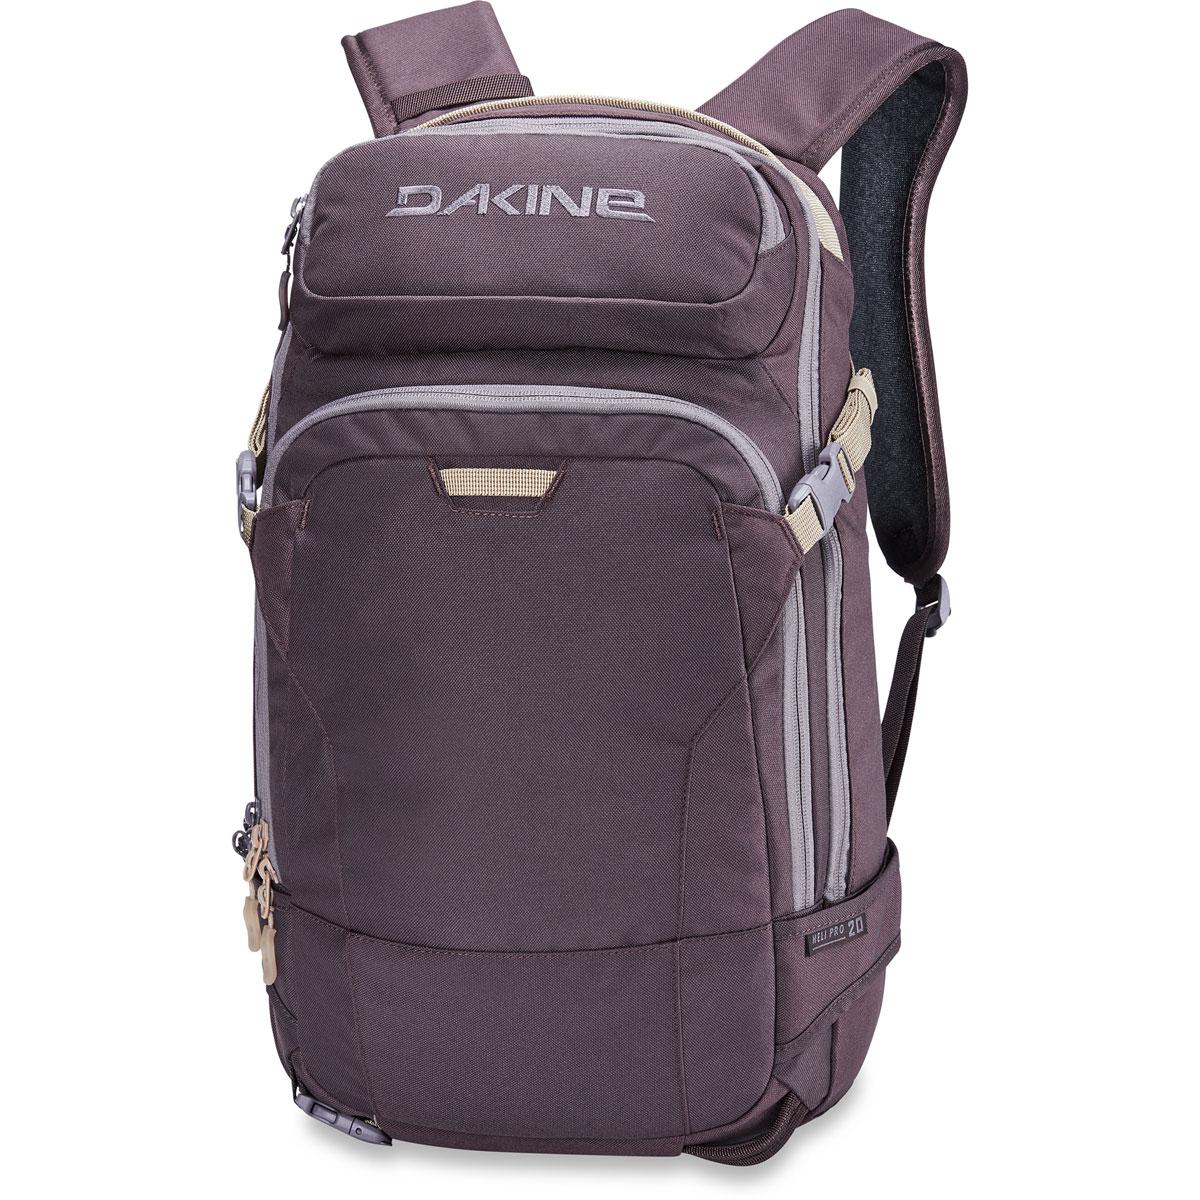 Dakine - Heli Pro 20L - Ski touring backpack - Women's